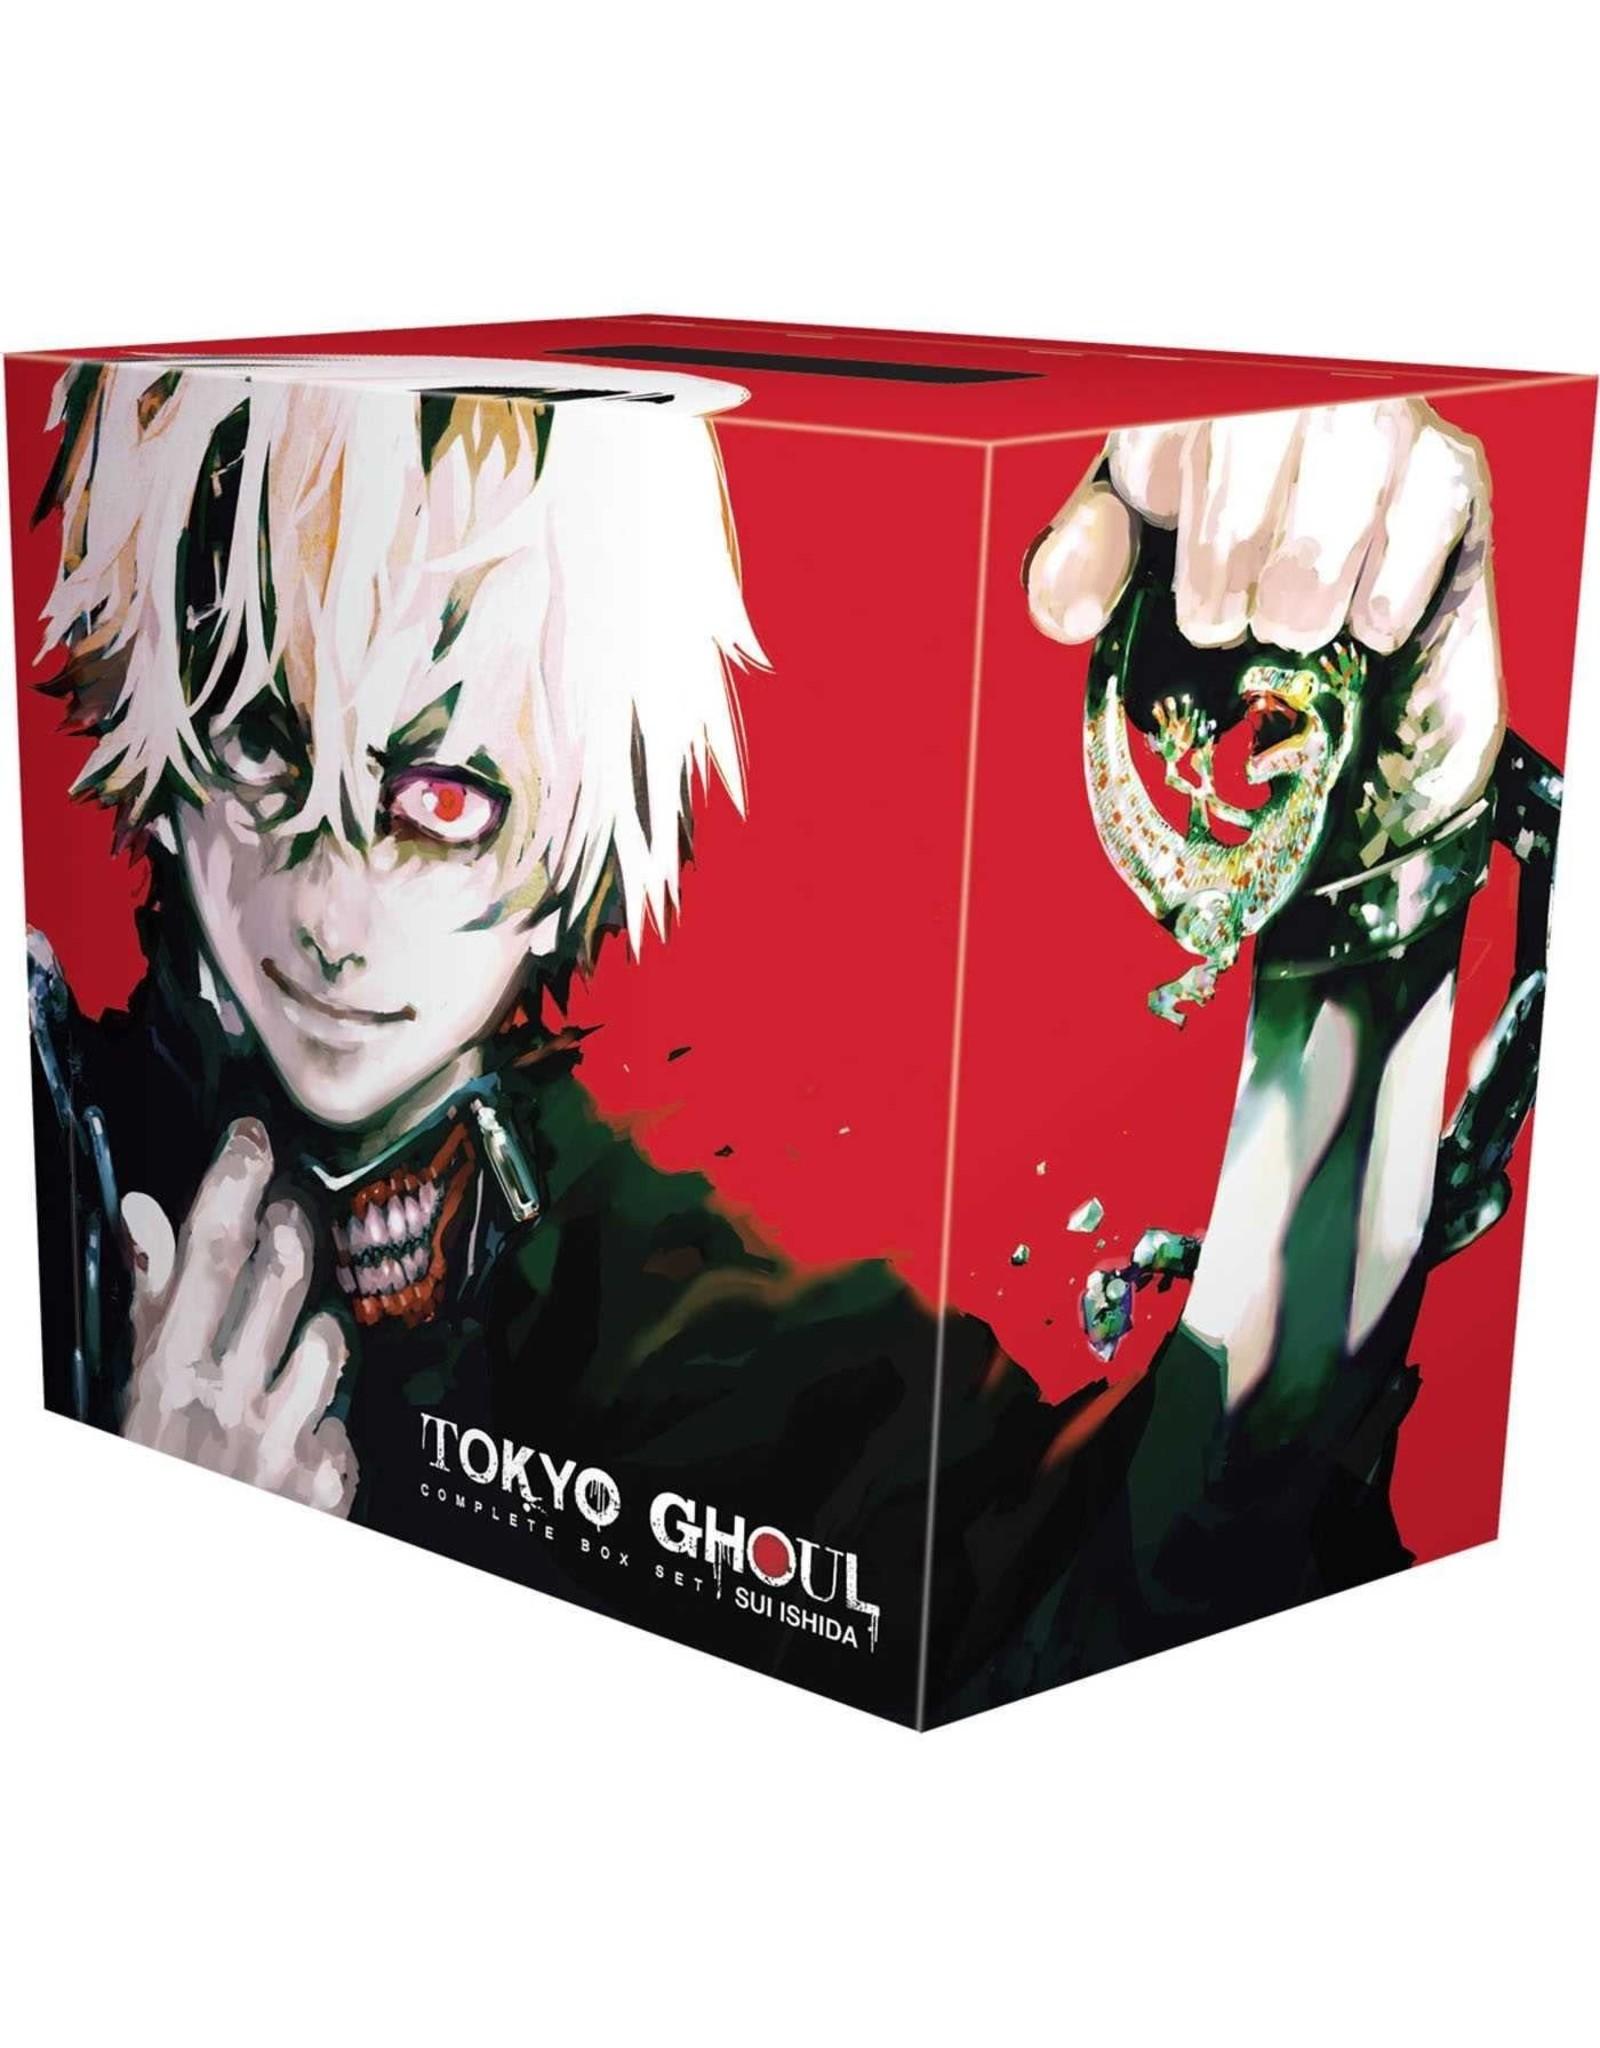 VIZ MEDIA LLC TOKYO GHOUL COMPLETE BOX SET VOL 1-14